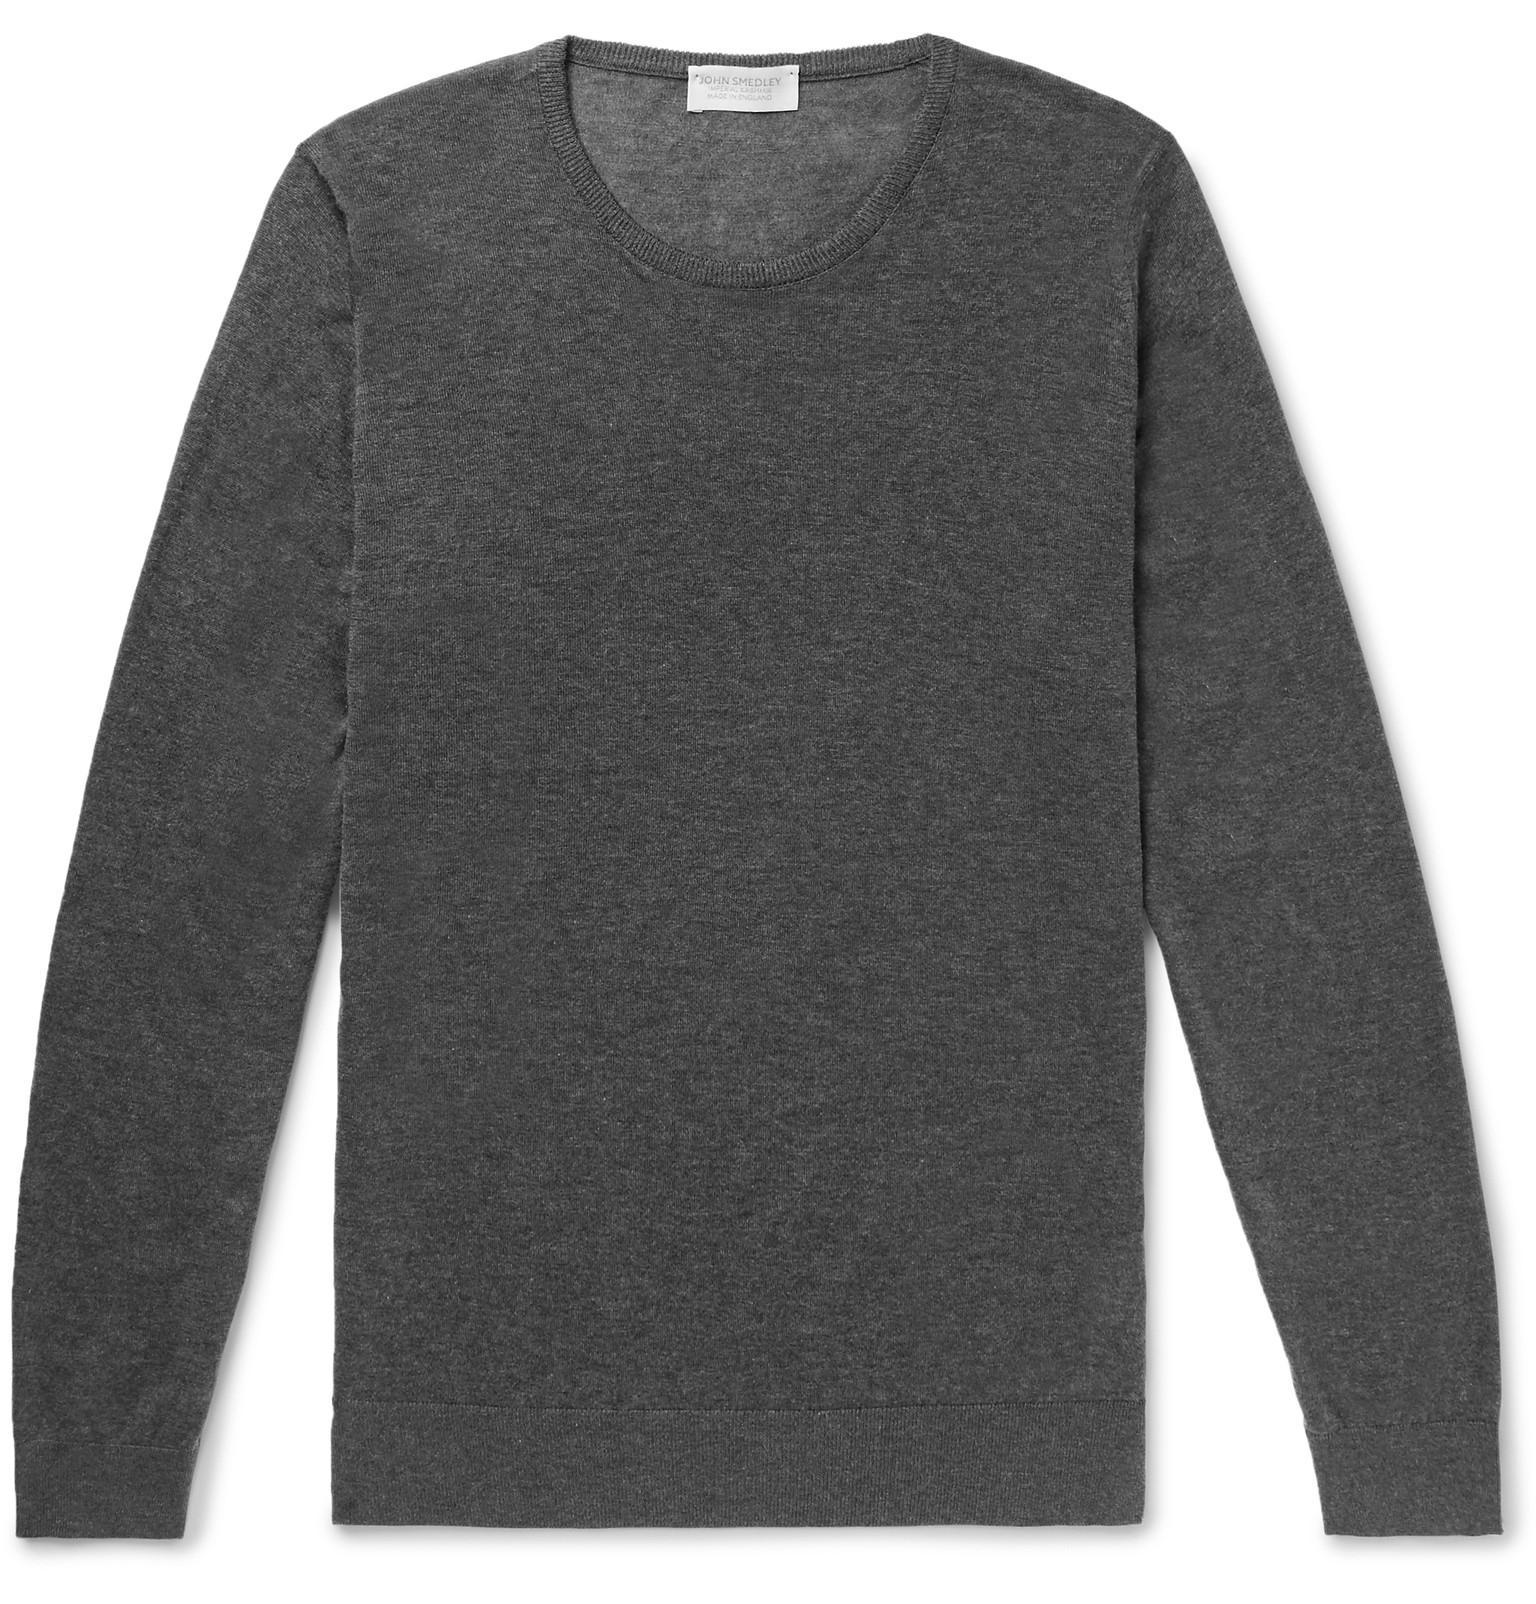 JOHN SMEDLEY Theon Slim-fit Sea Island Cotton And Cashmere-blend Sweater - Burgundy 4V9Jl3MwuO